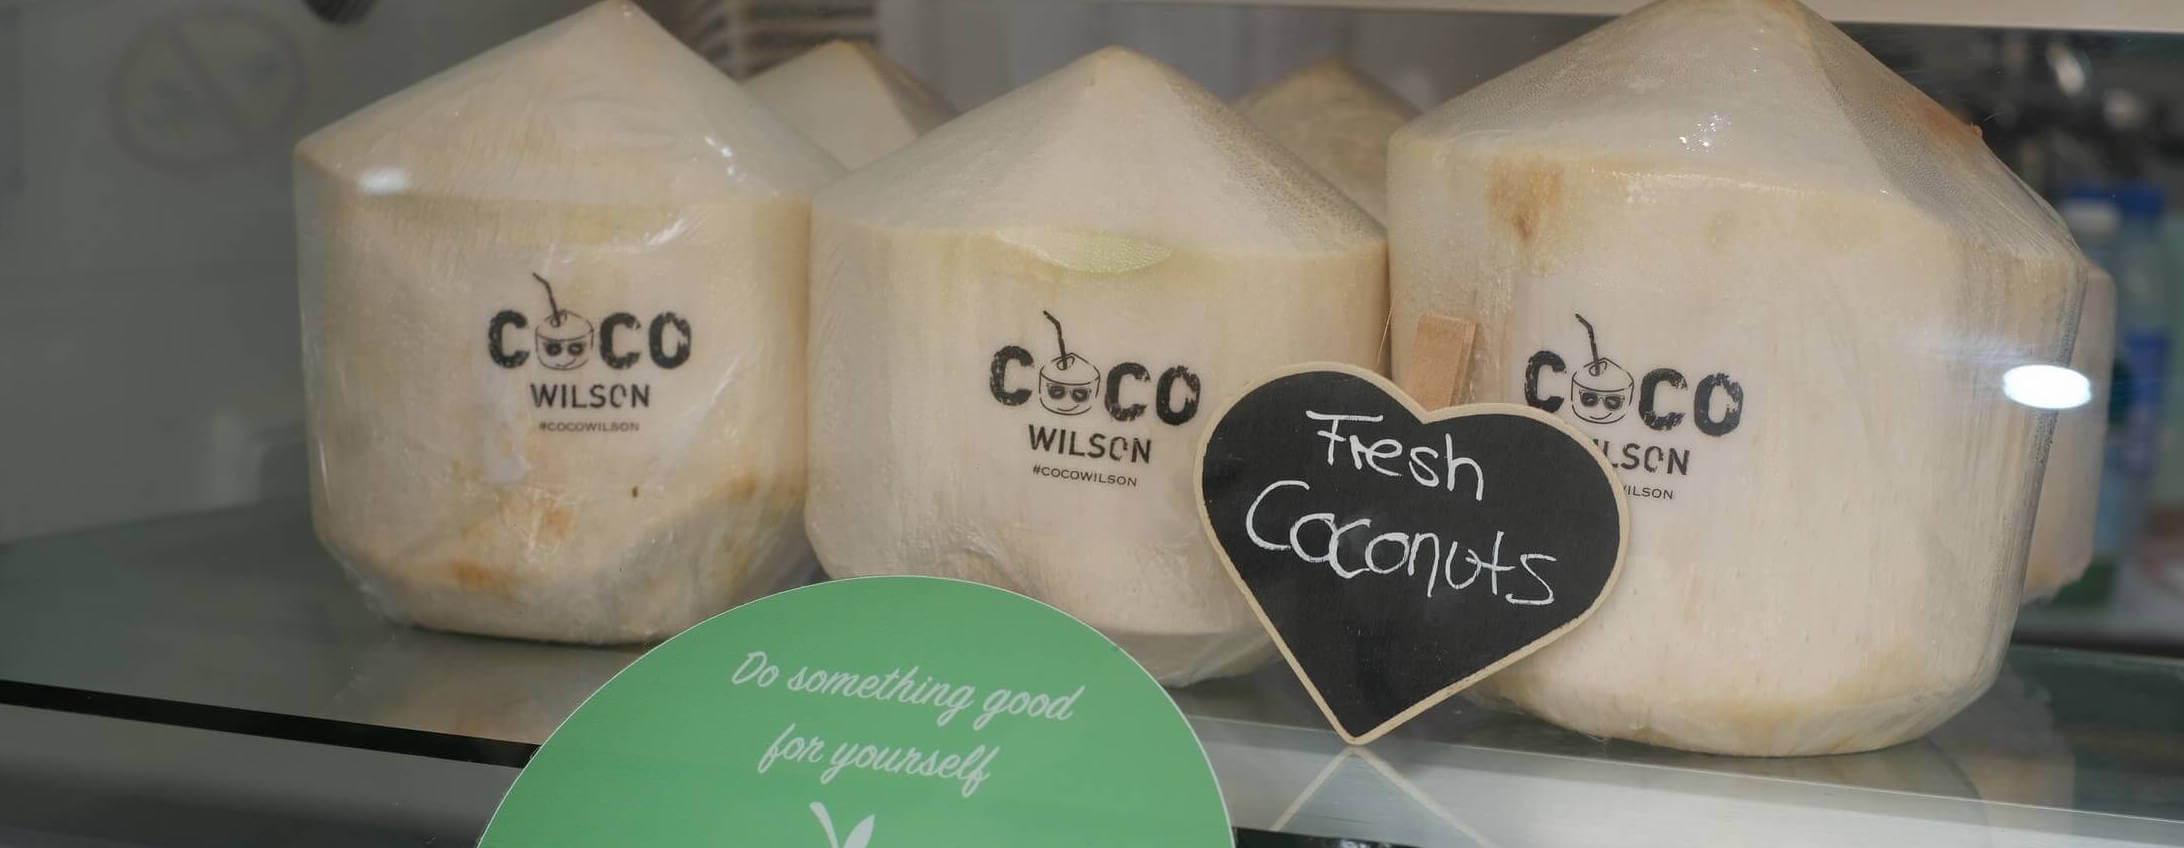 fresh-coconut-healthy-superfood-milk-ronis